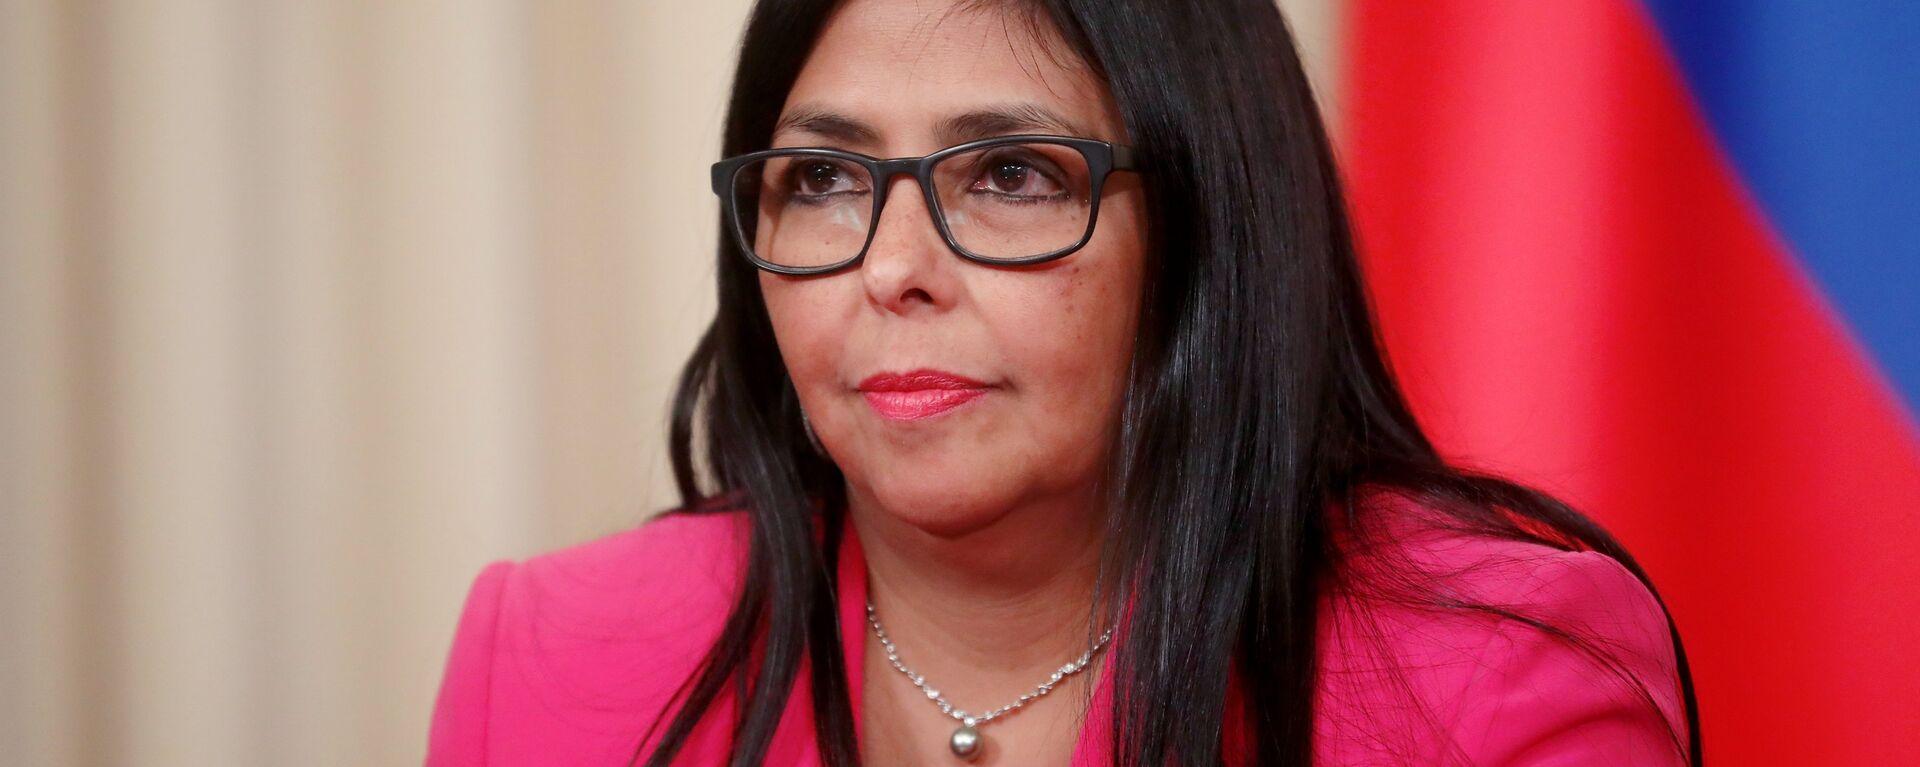 Delcy Rodríguez, vicepresidenta de Venezuela - Sputnik Mundo, 1920, 27.05.2021